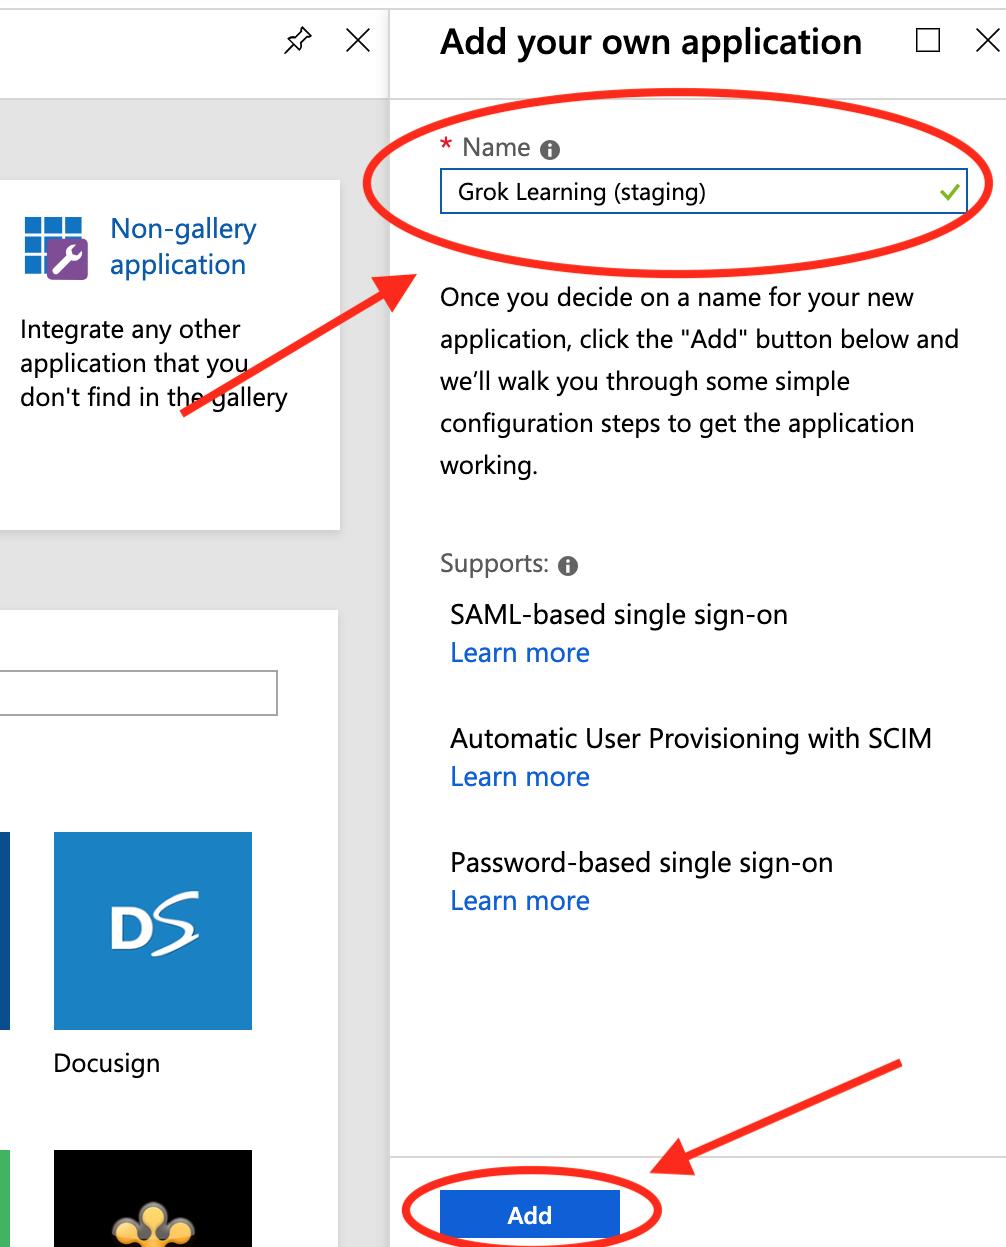 SAML SSO - I'm using Azure AD (Microsoft, Cloud) - Grok